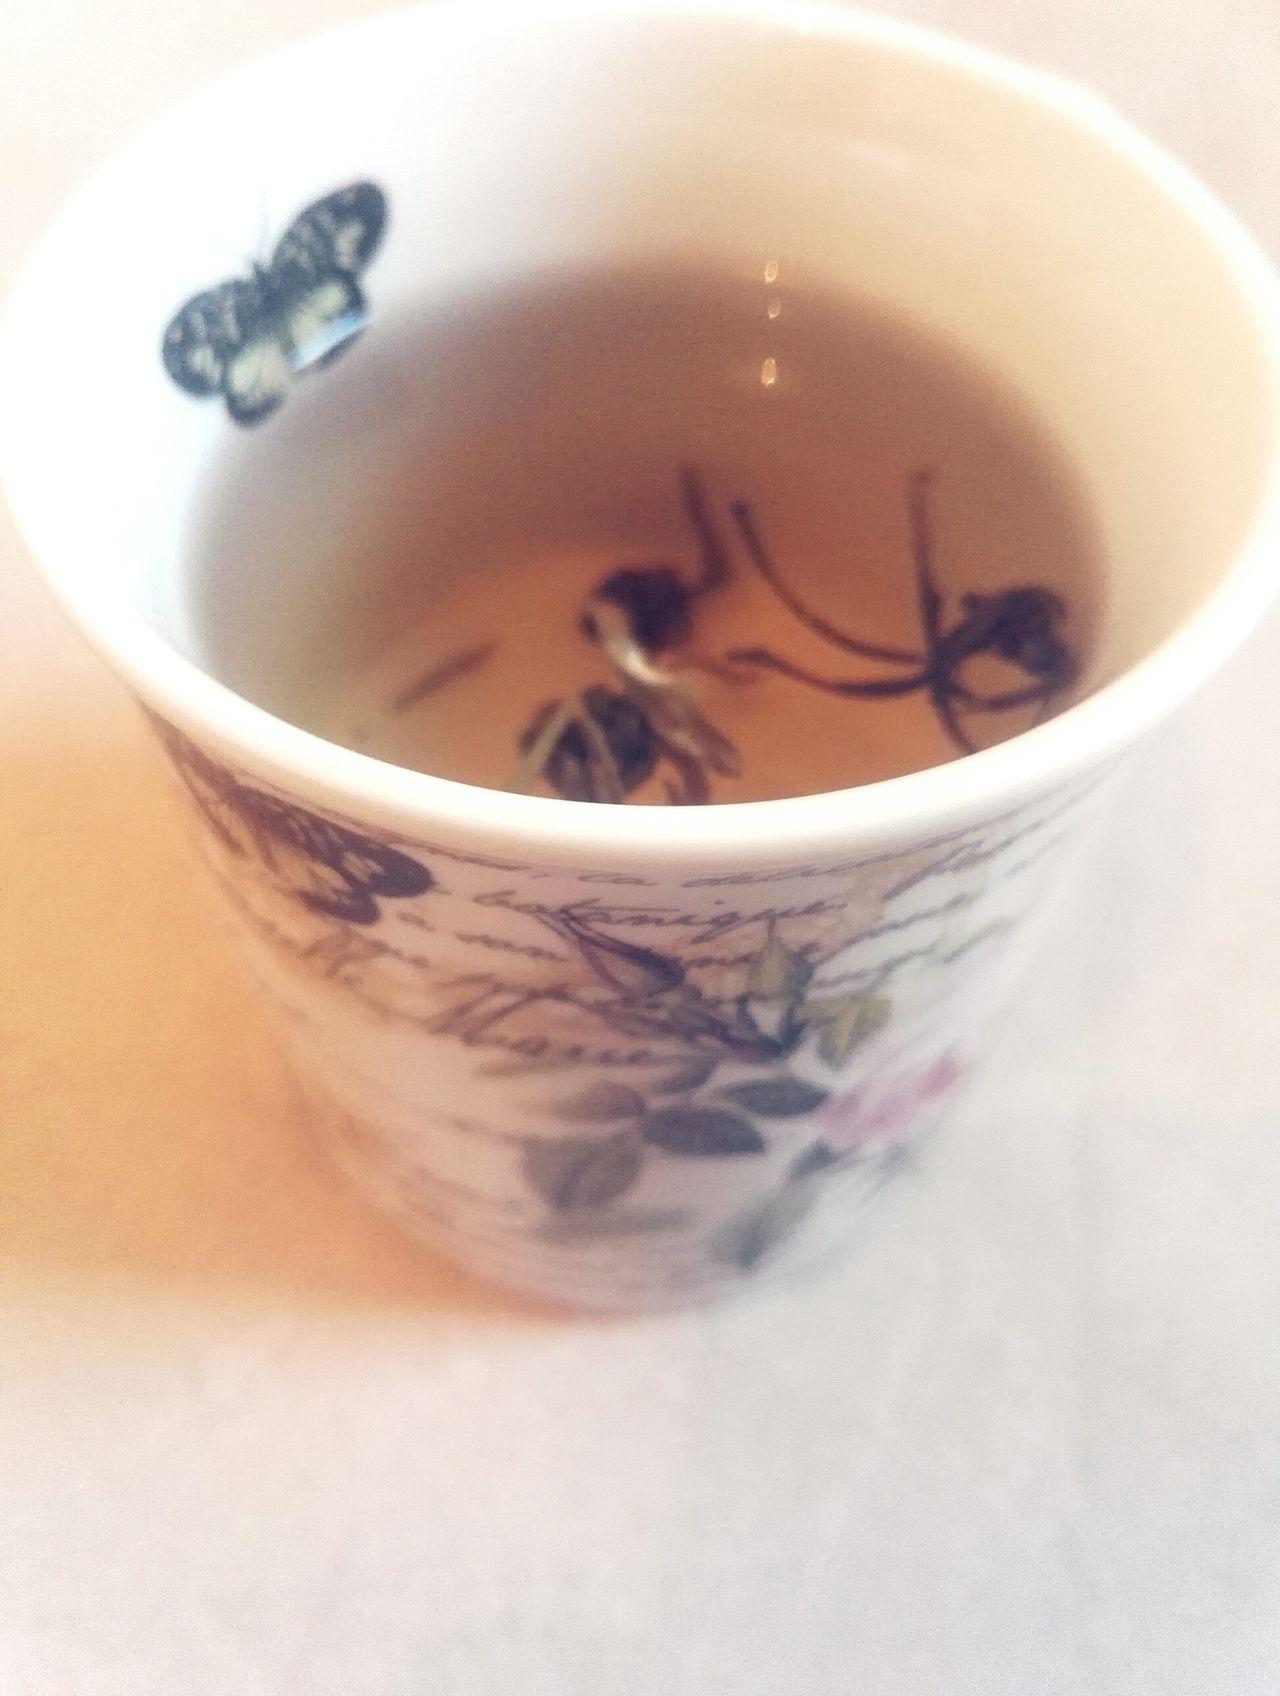 Vertical Refreshment Tea - Hot Drink Drink Close-up Indoors  No People Day Freshness Vietnamese Jasmine Jasmine Tea Jasmine Flower